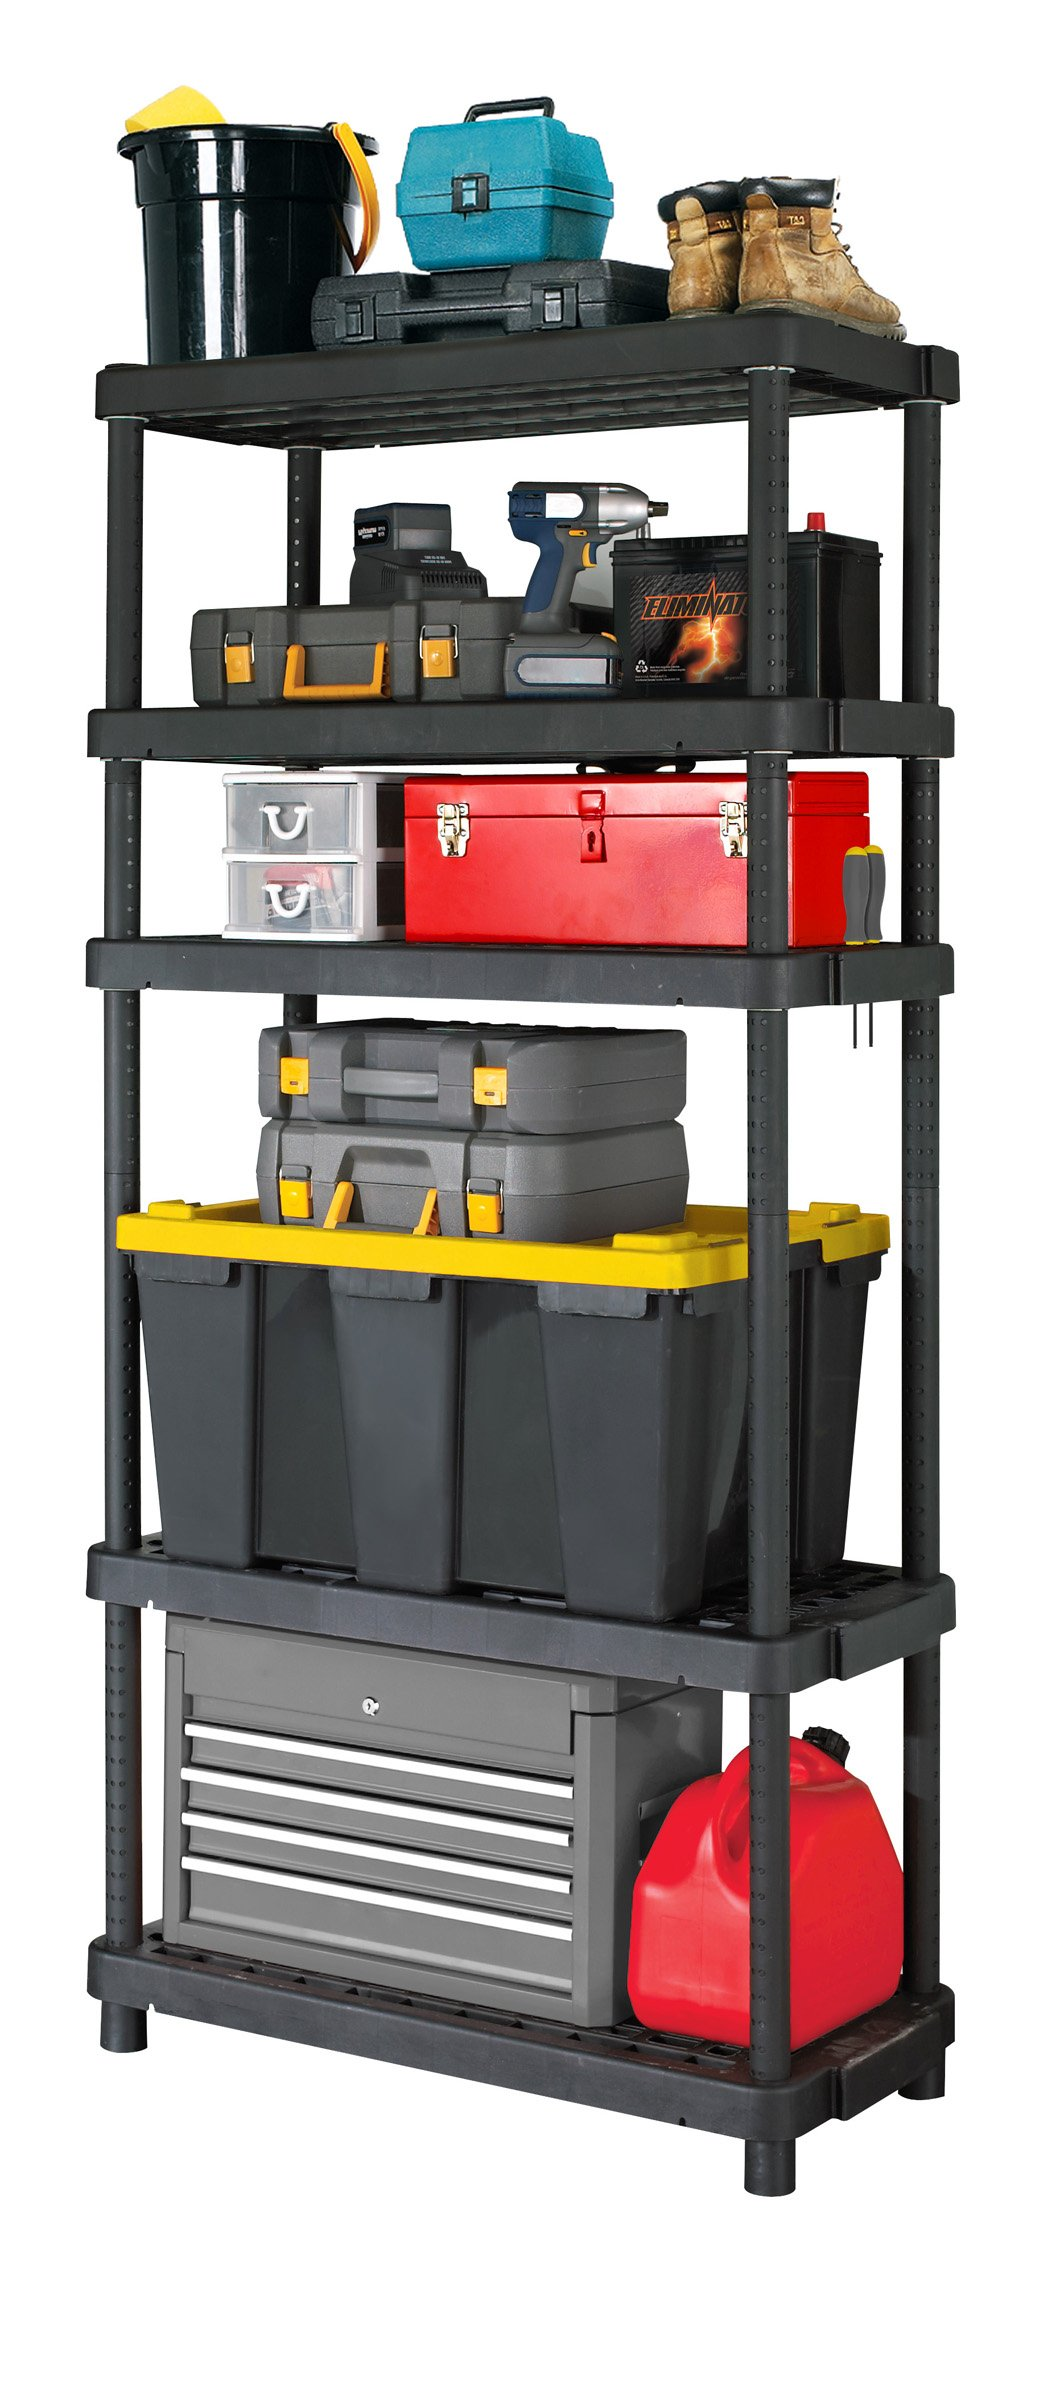 Gracious Living Adjustable 5-Shelf Heavy Duty Shelving Unit